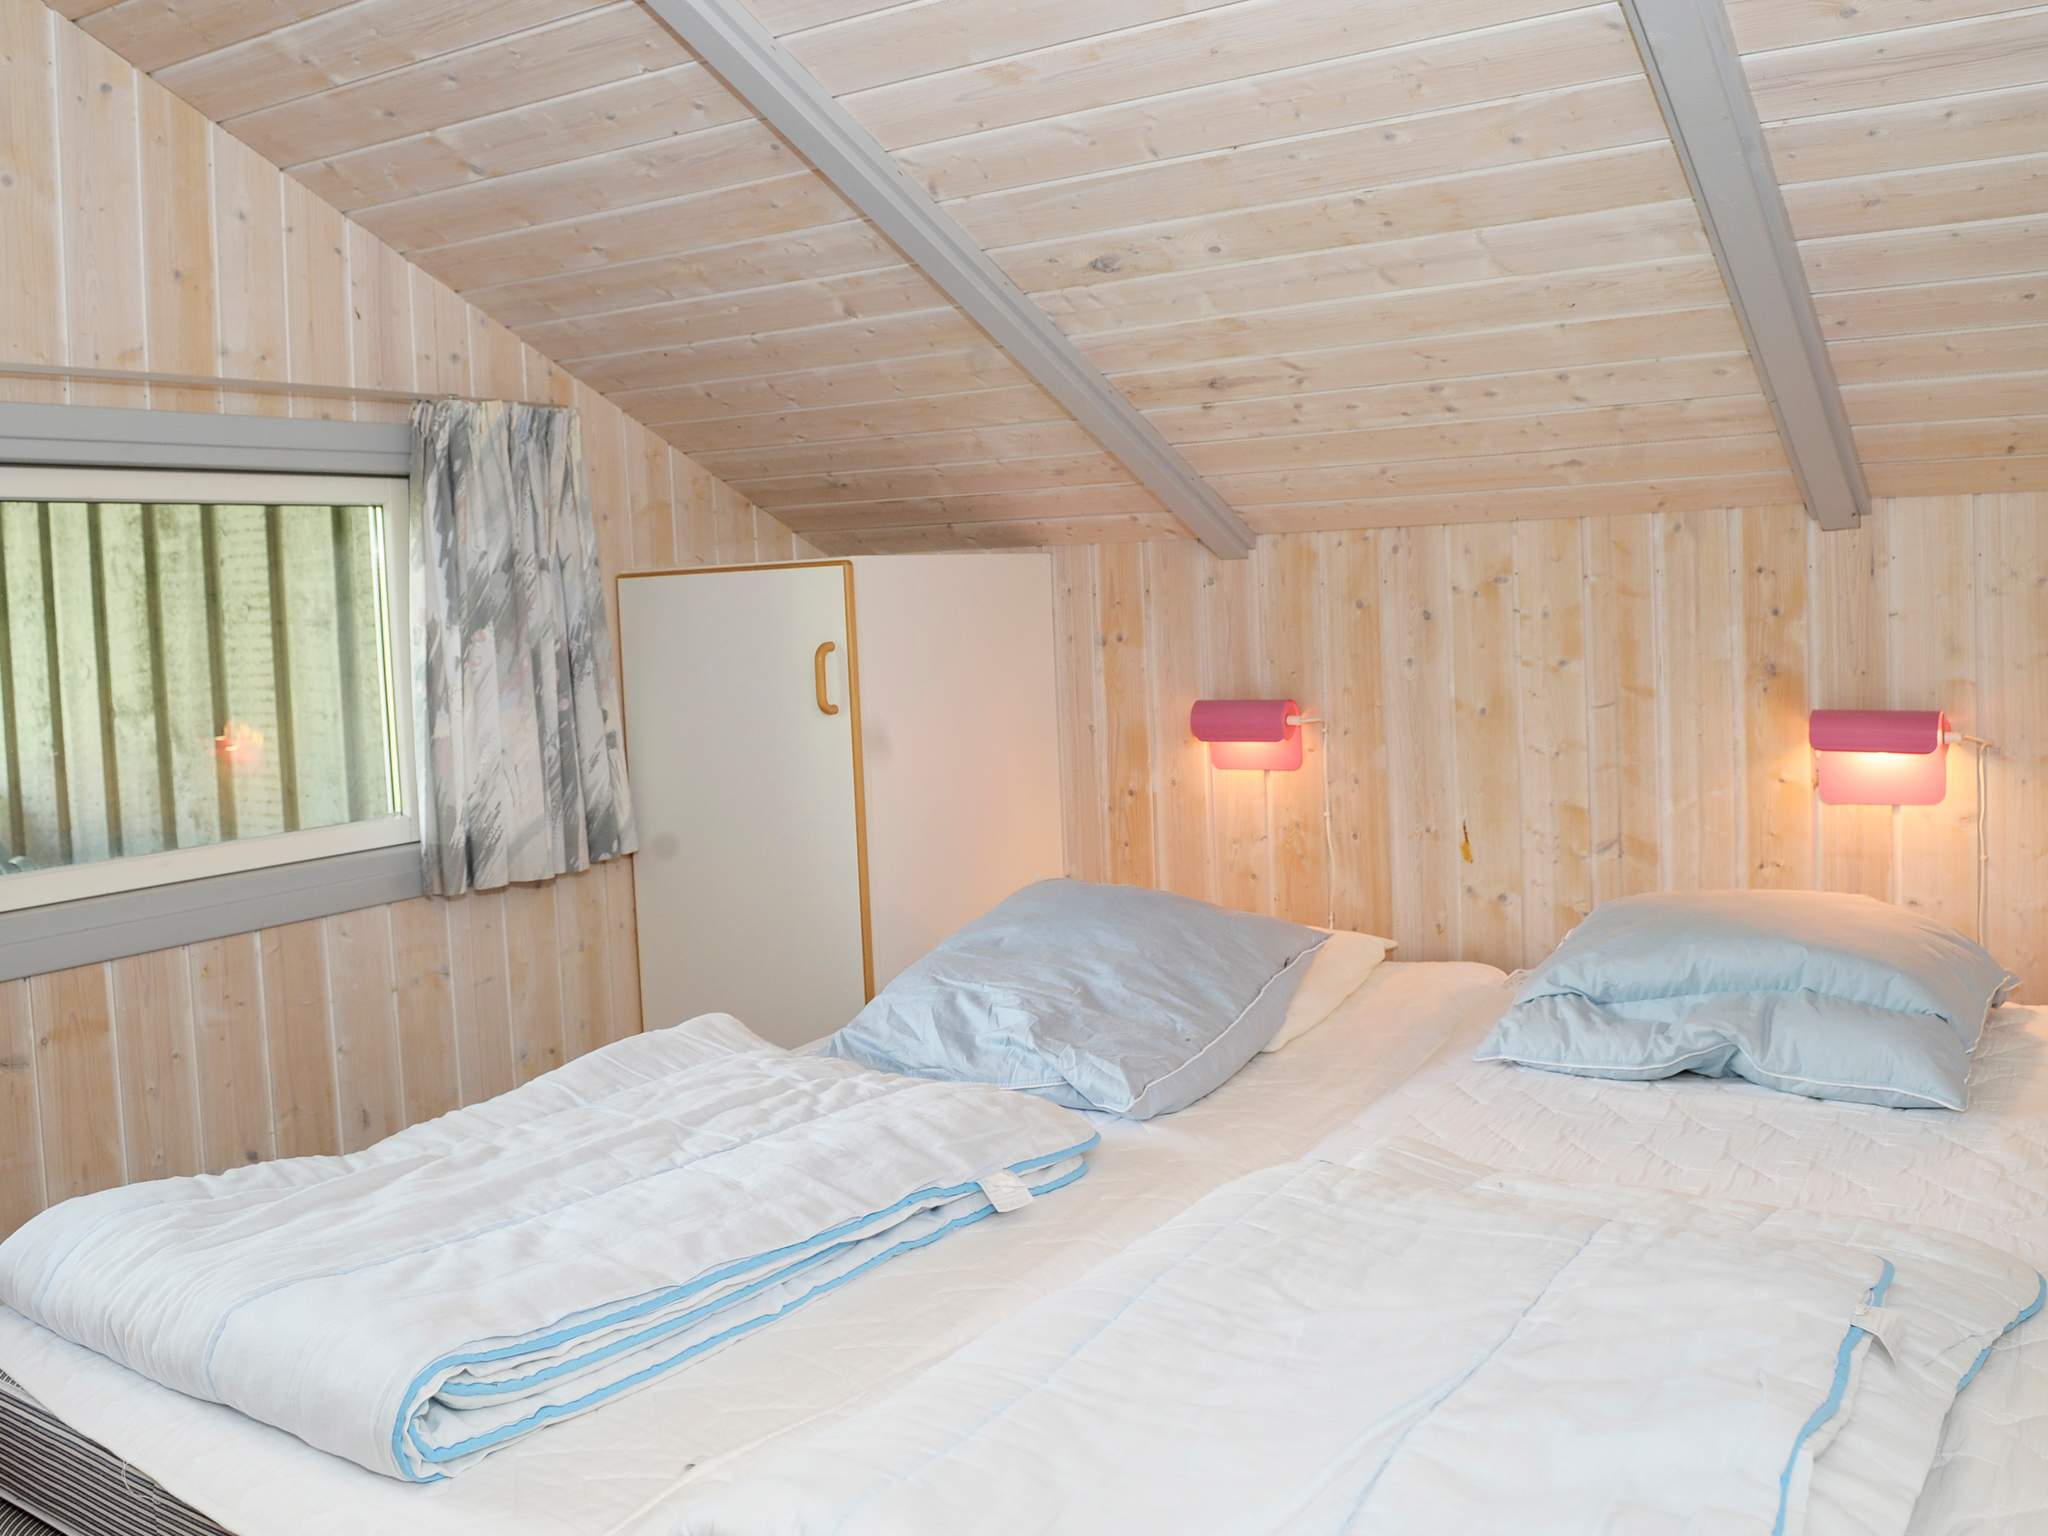 Ferienhaus Ristinge (93203), Ristinge, , Langeland, Dänemark, Bild 21